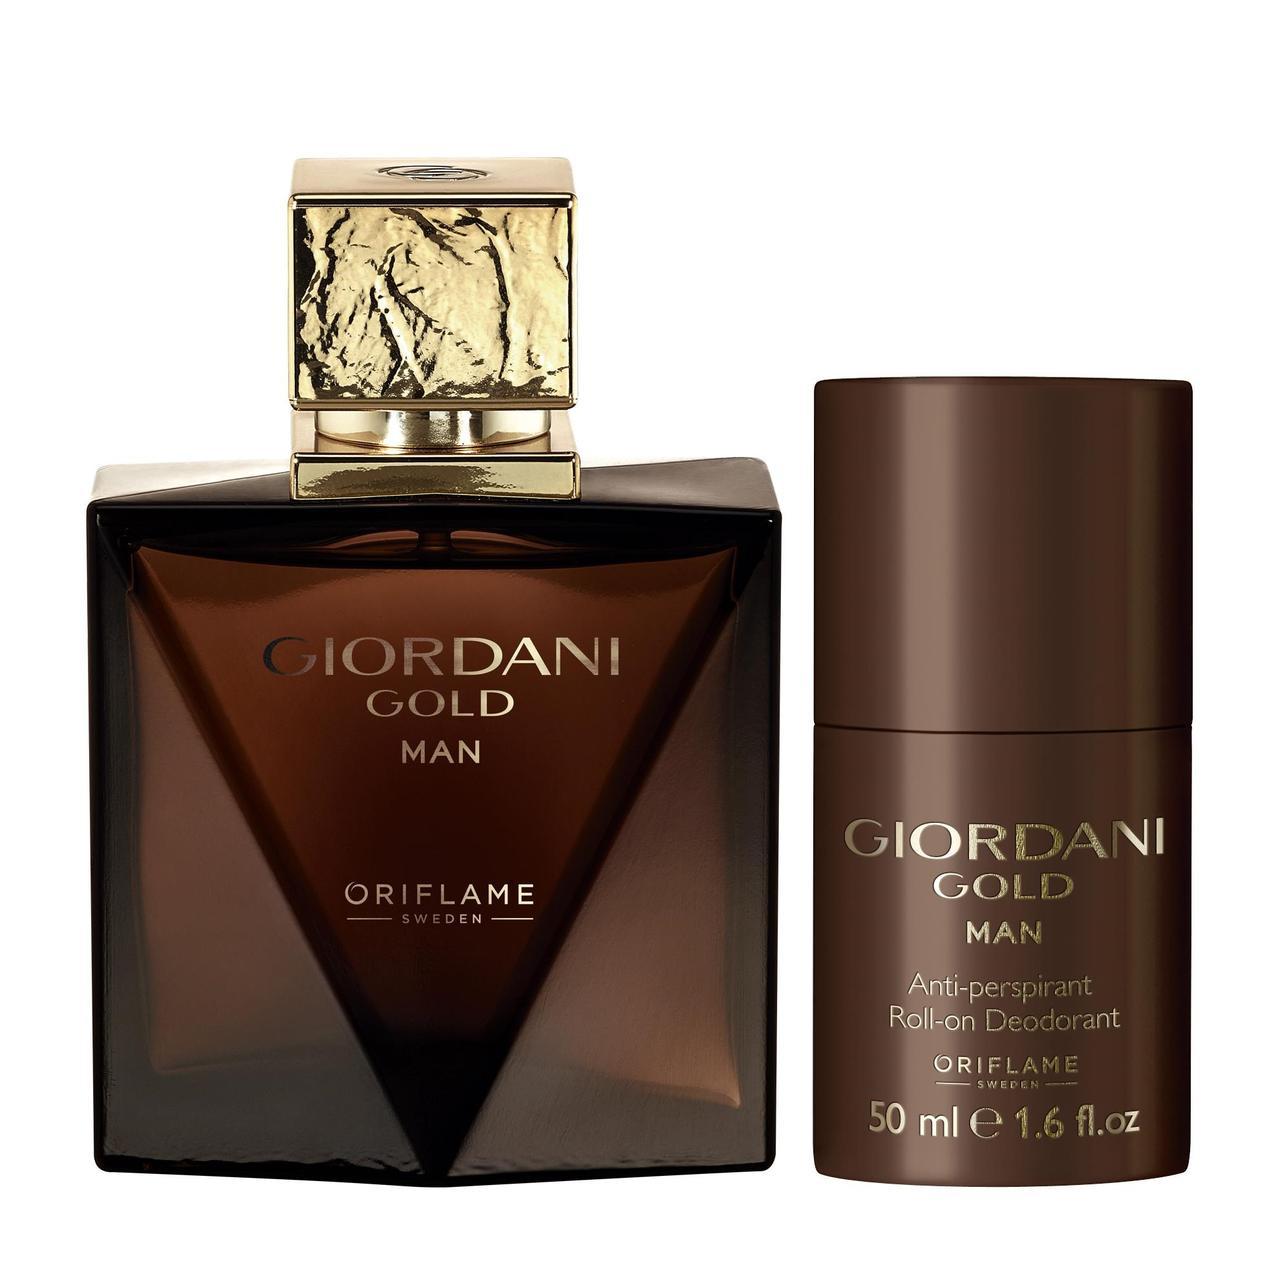 Набор Giordani Gold Man Oriflame